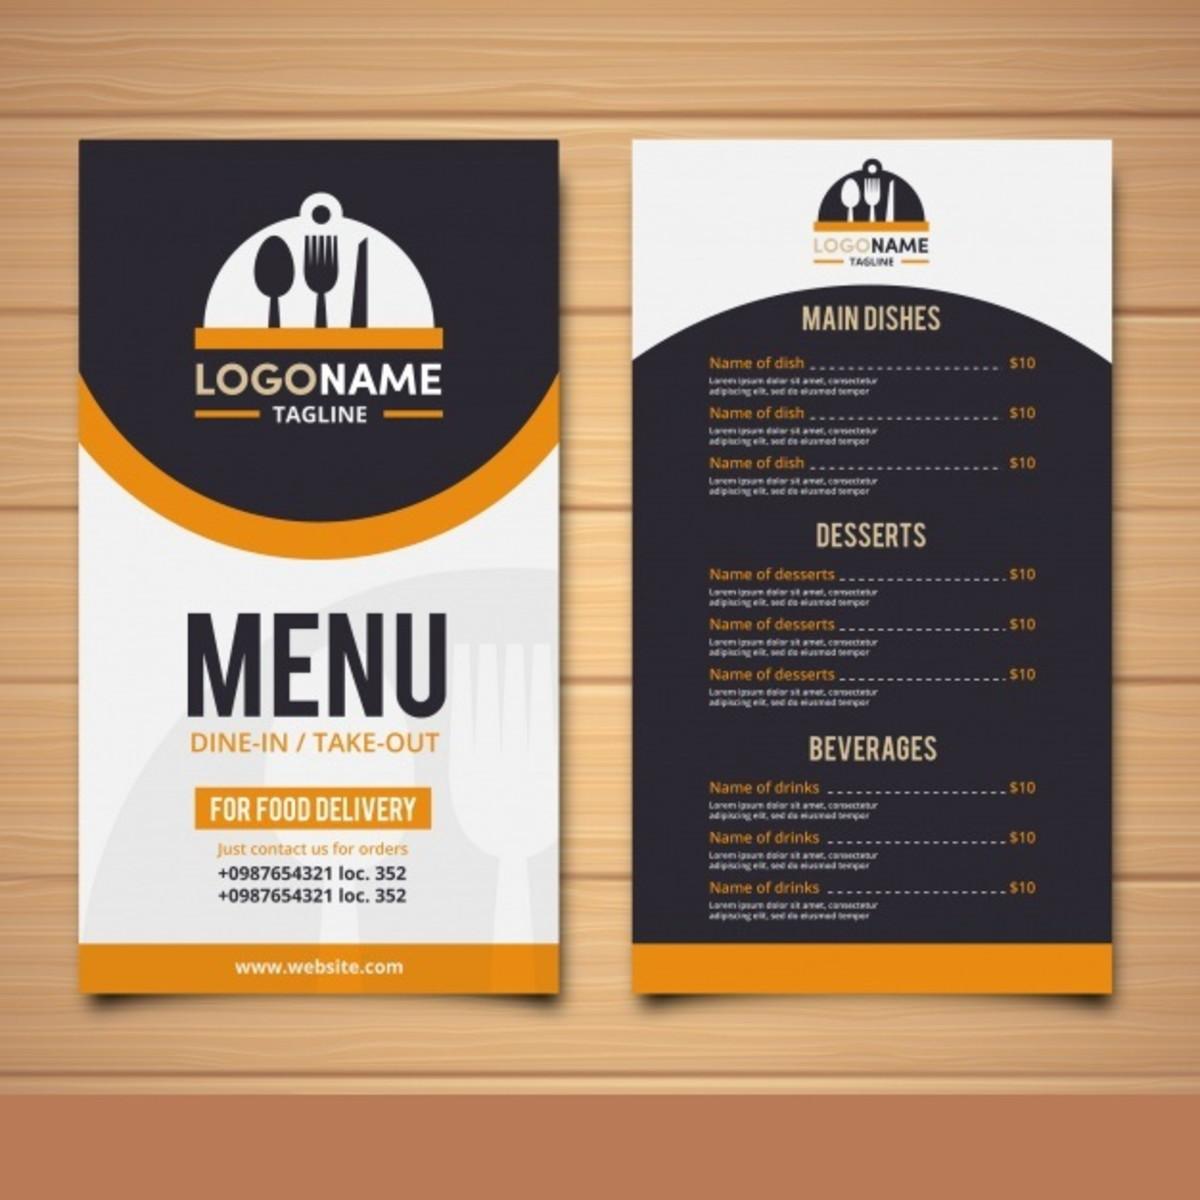 Website Design New Ideas: Arte Final Digital Cardápio Restaurante